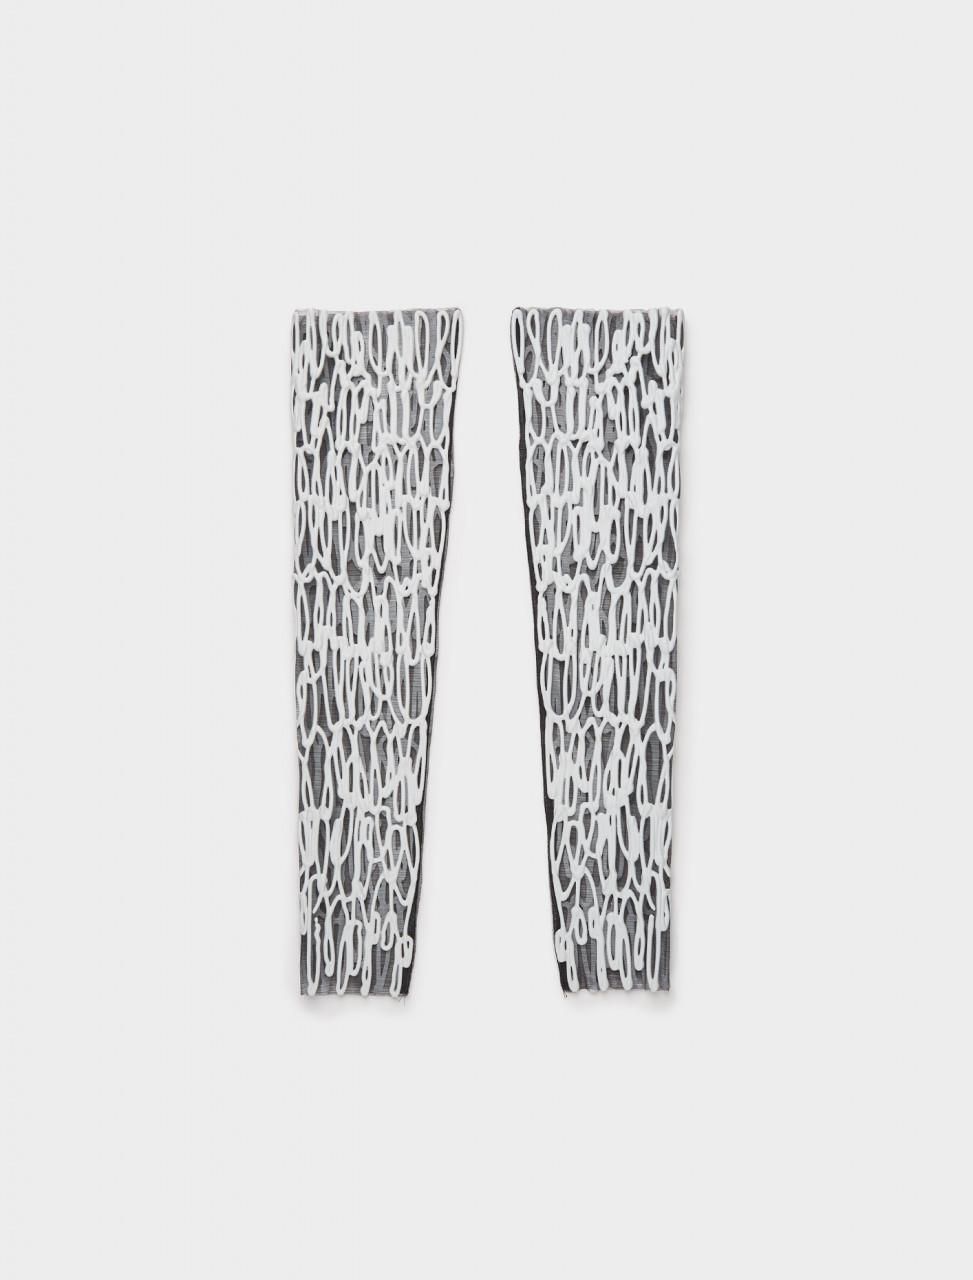 1000710 KASIA KUCHARSKA ARM OR LEG PIECE PAIR BLACK WHITE